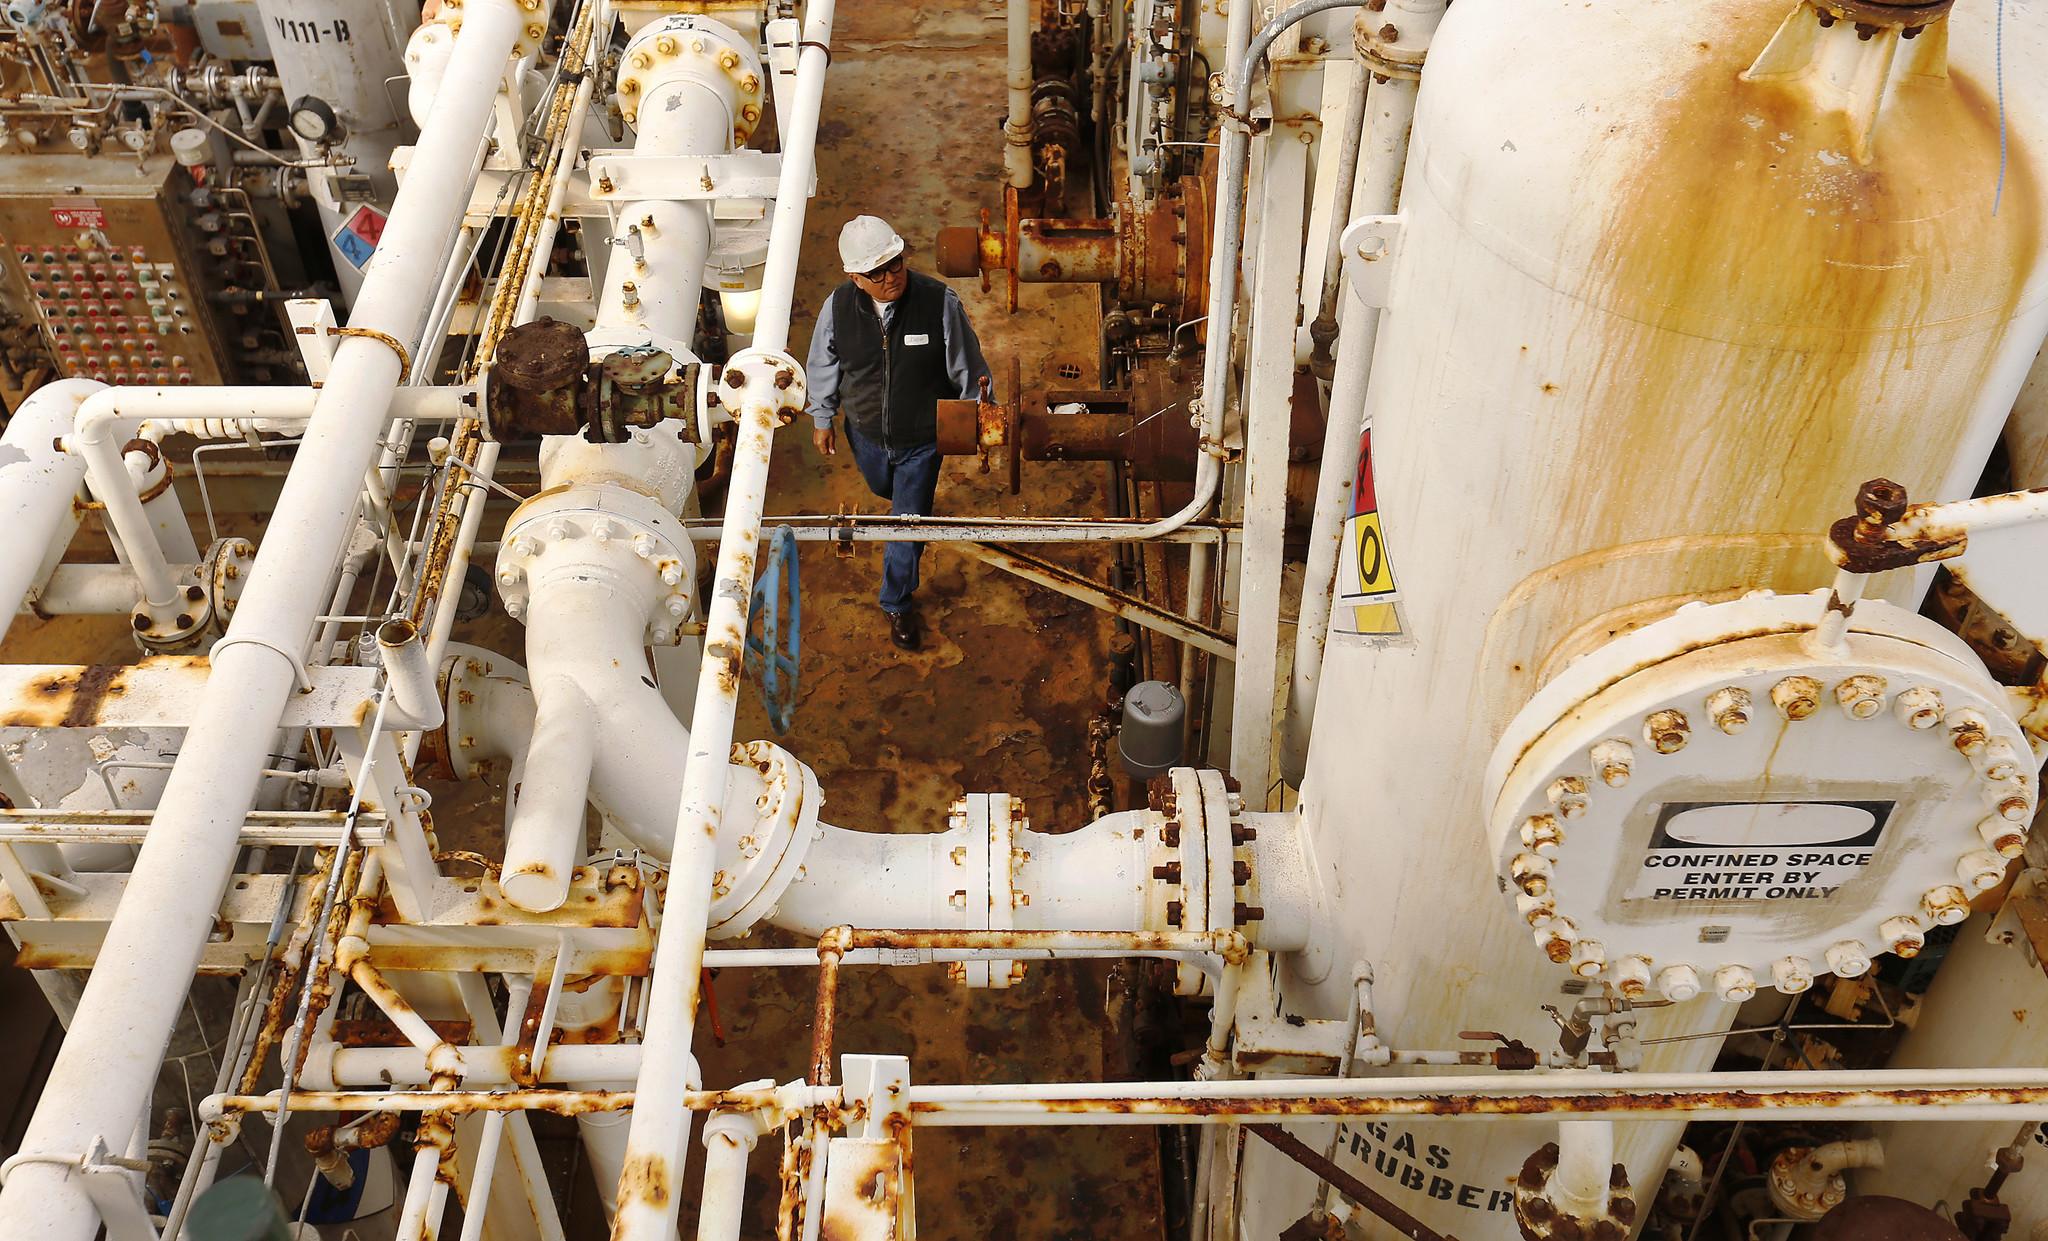 A historic oil platform off Santa Barbara turns into a rusty